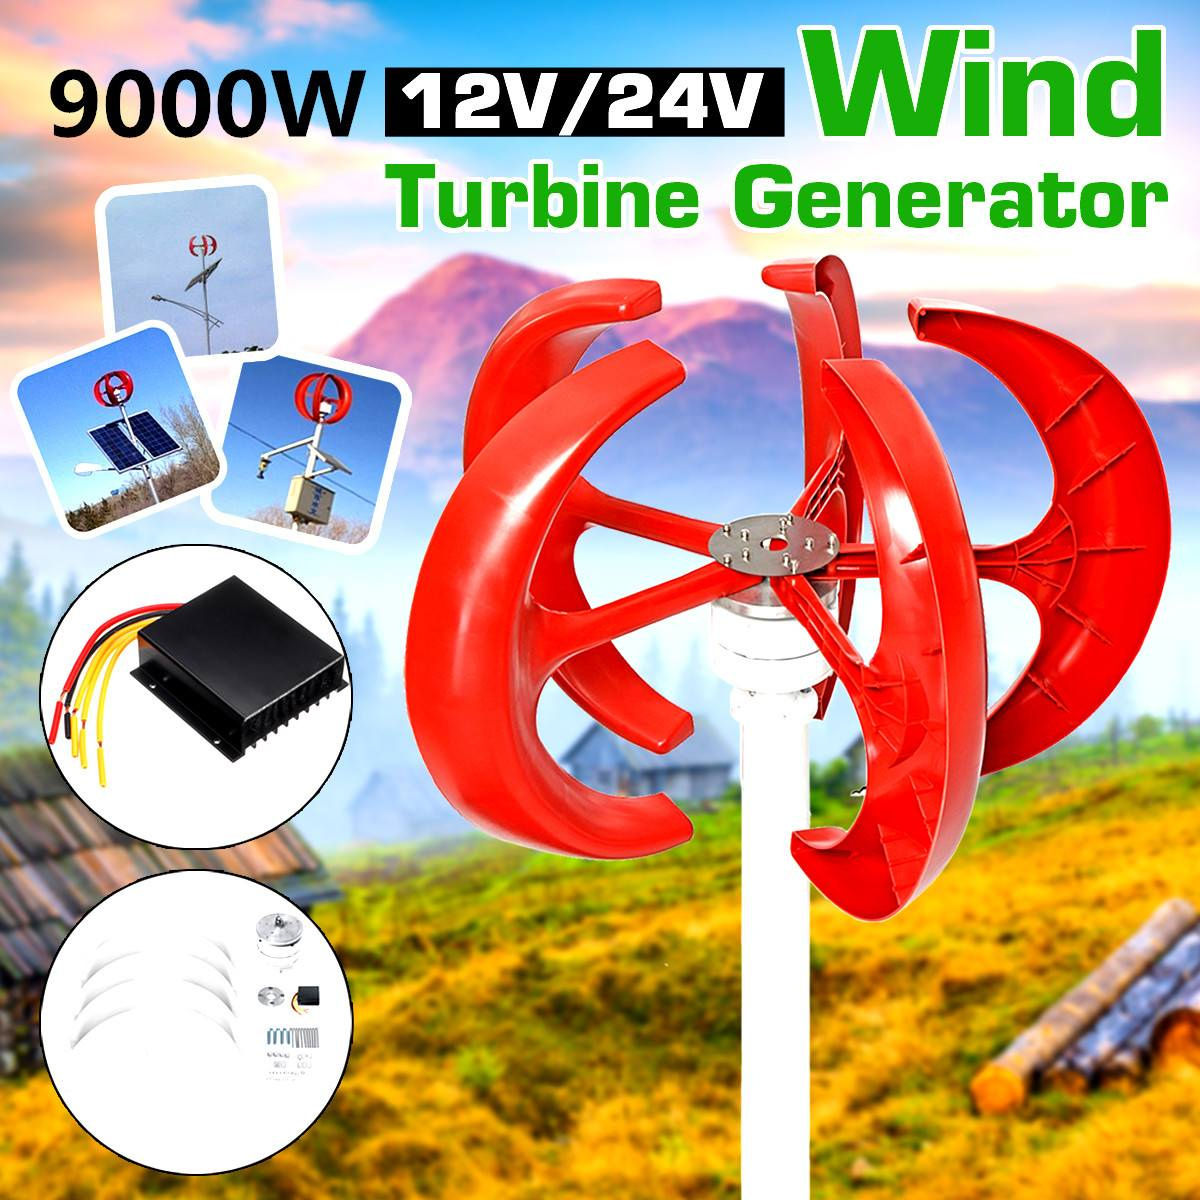 9000W Vertical Axi Wind Turbines Generator Lantern 12V 24V 5 Blades Motor Kit For Home Hybrids Streetlight Electromagnetic